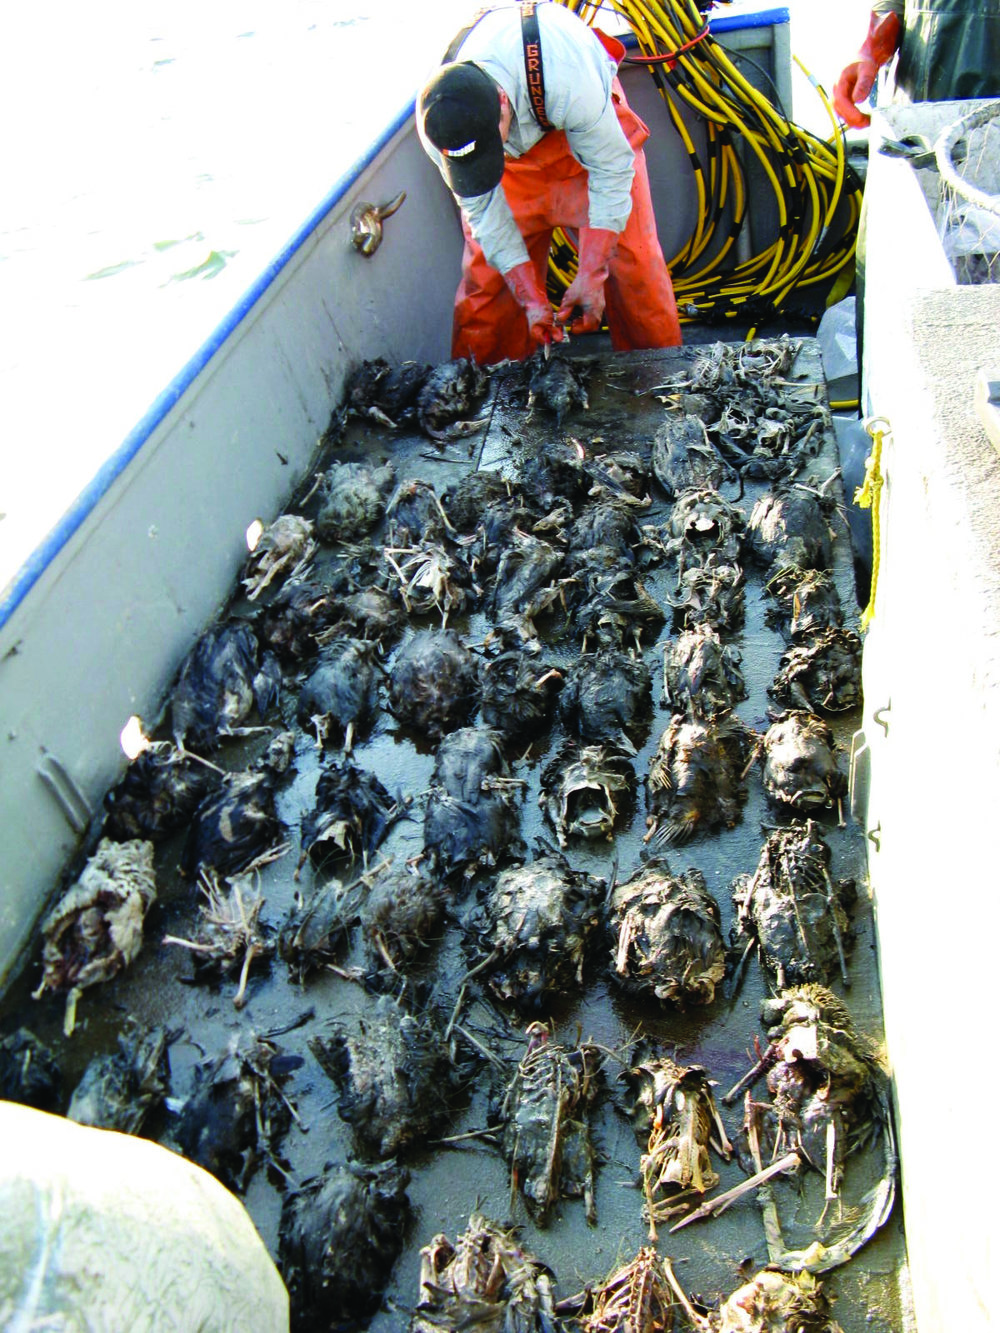 Bird-carcasses-lined-up-on-deck-2008_byNorthwest-Straits-Foundation.jpg